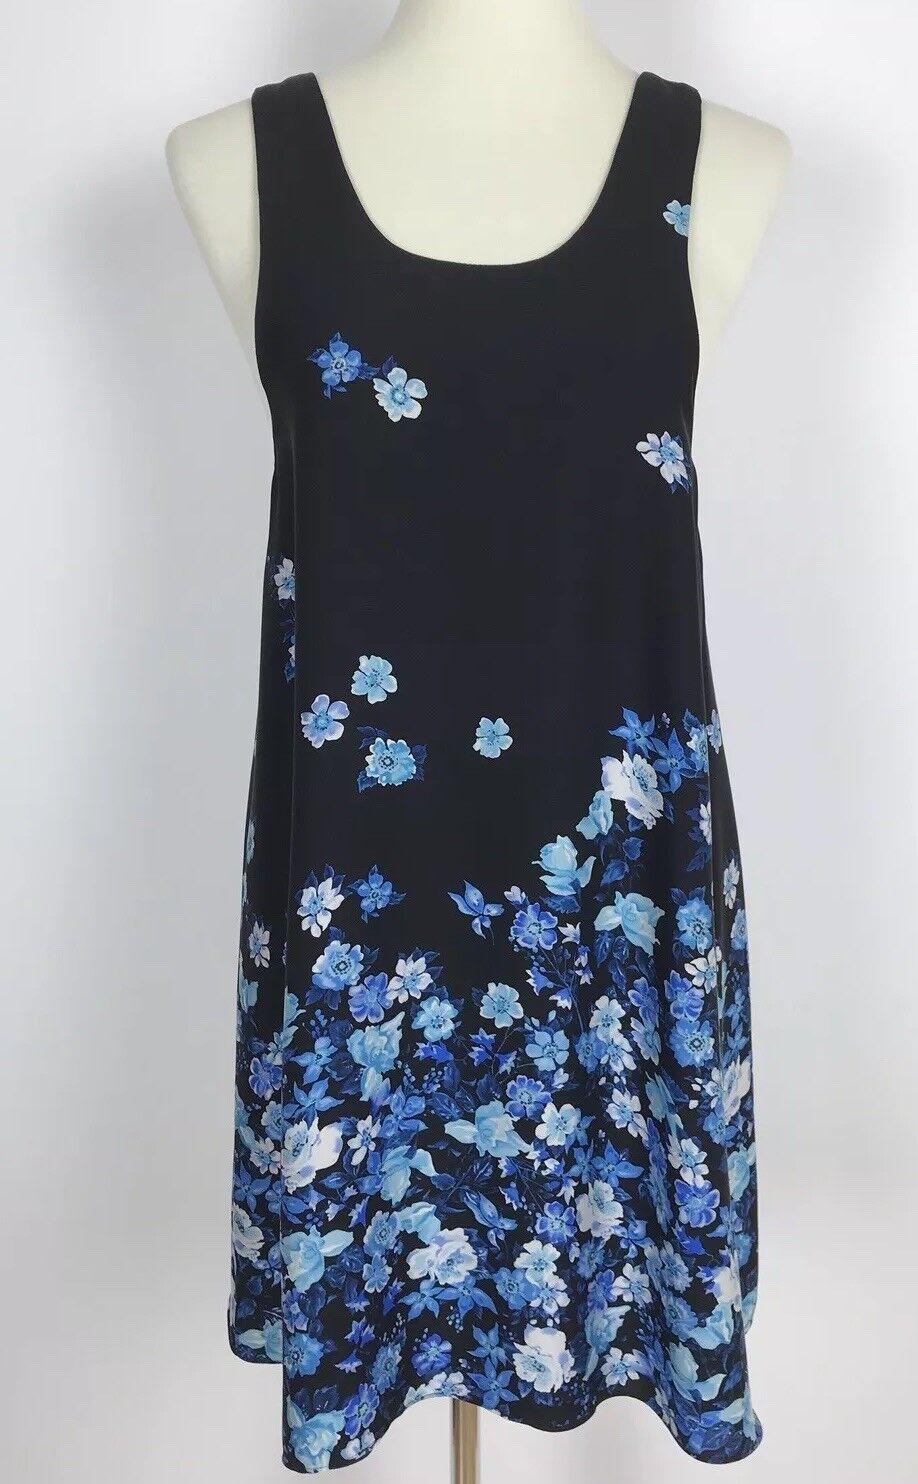 Alice + Olivia schwarz Silk Shift Dress Blau Floral Print Sleeveless damen's XS